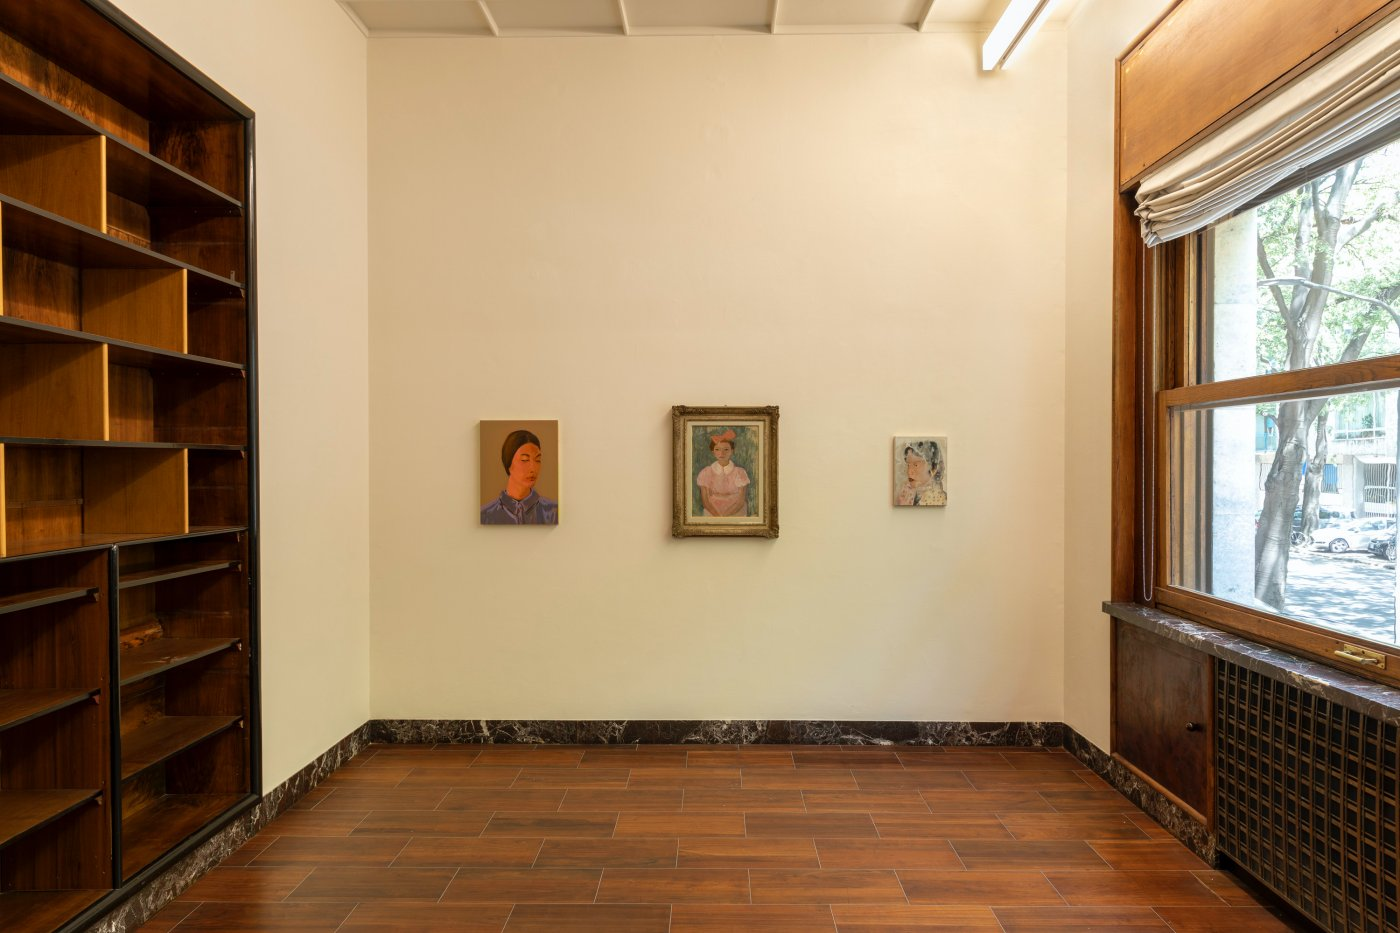 Massimo de Carlo Milan Portraiture One Century Apart 2